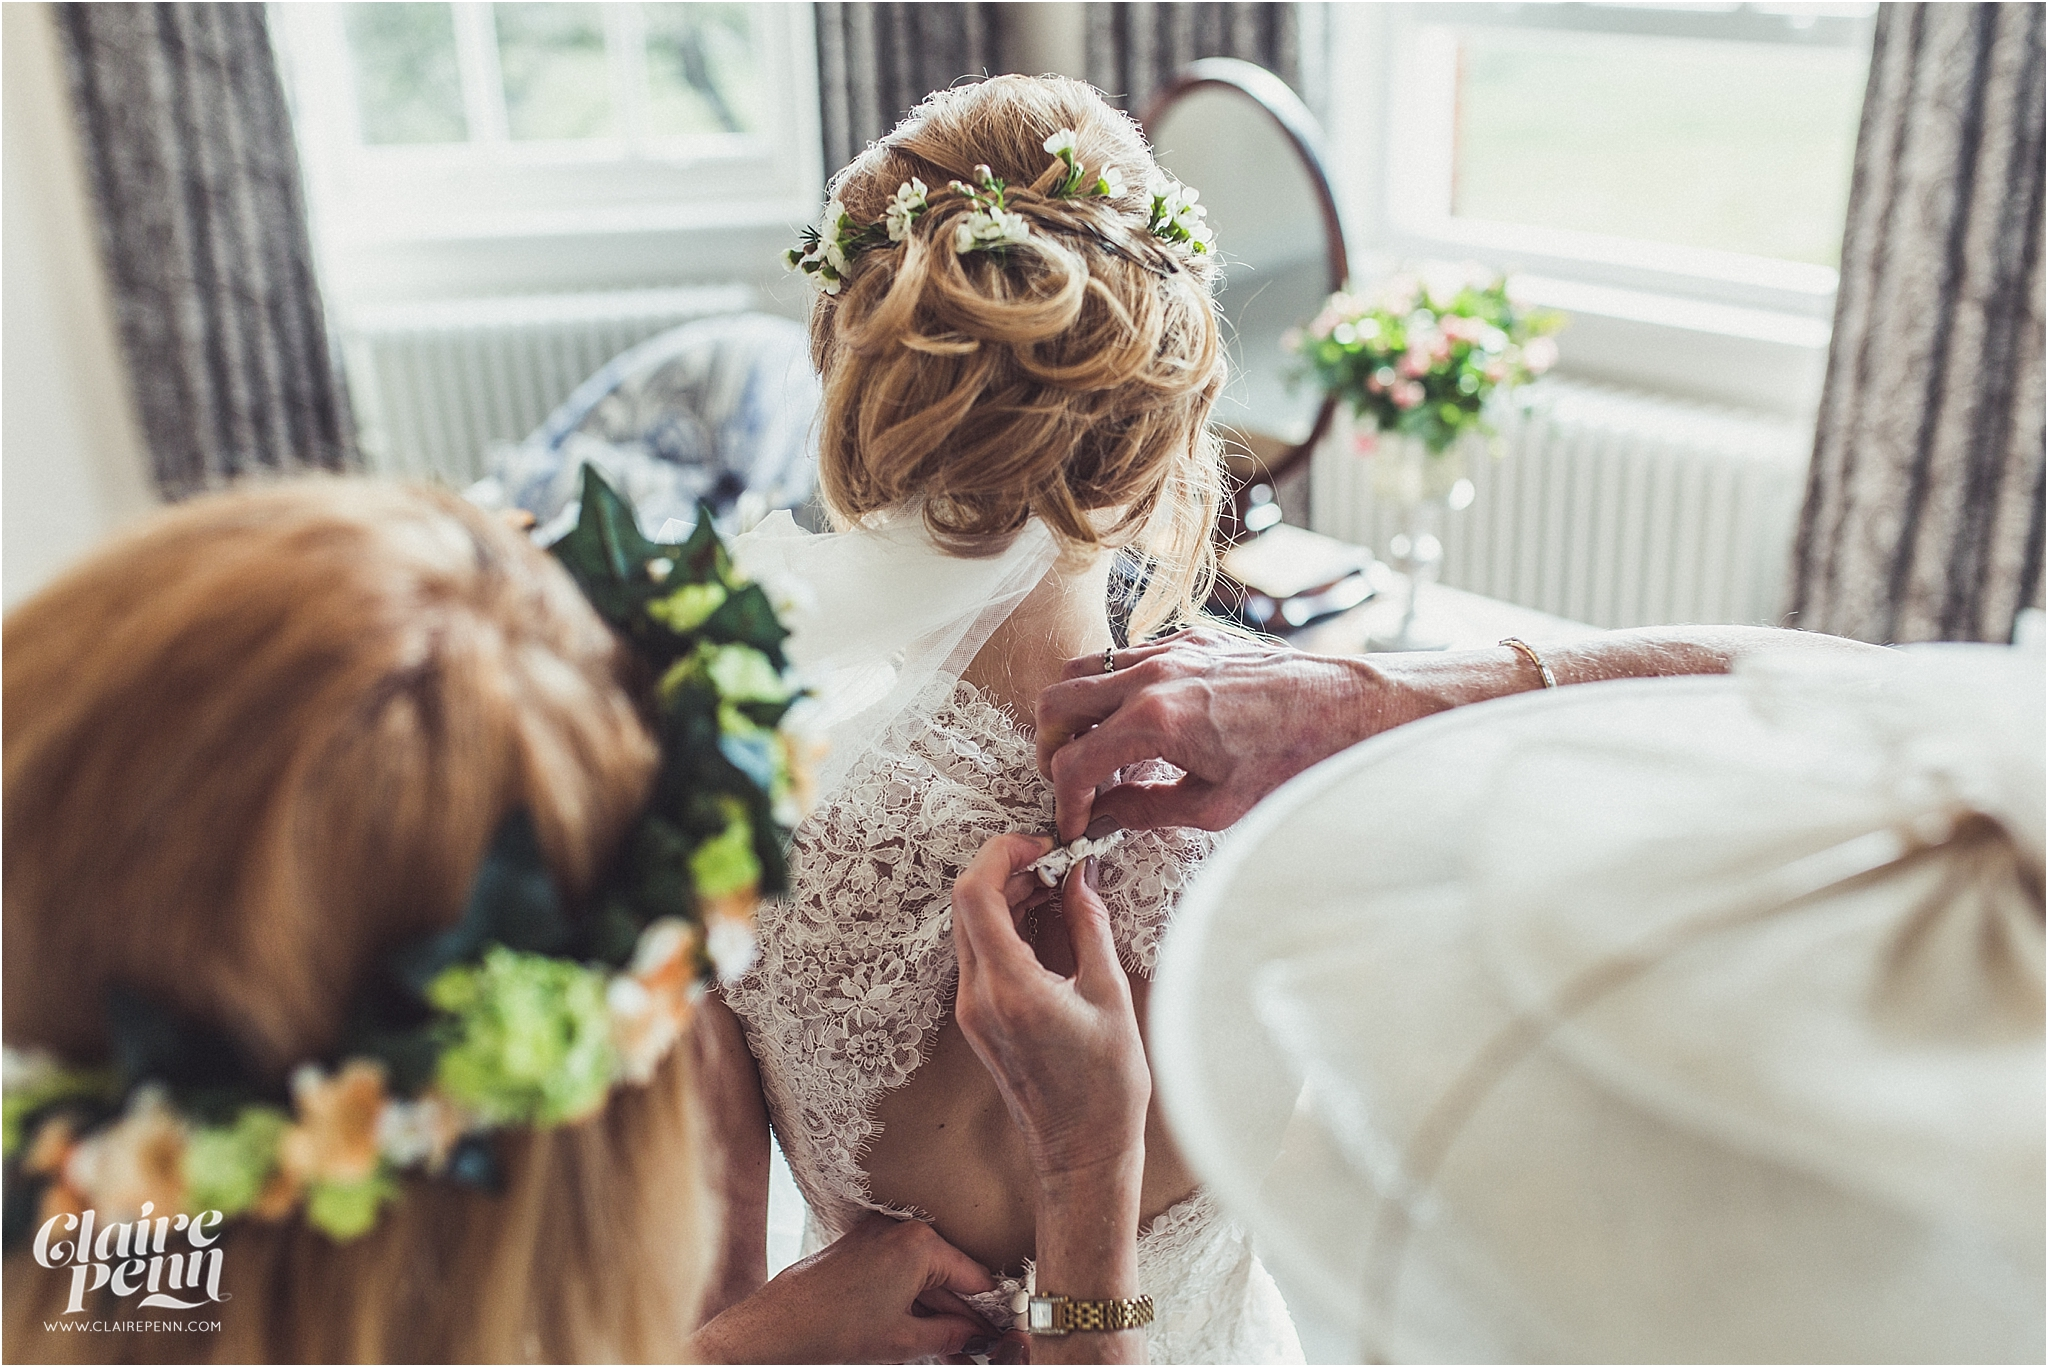 Iscoyd Park wedding, Whitchurch, Cheshire wedding photographer_0010.jpg